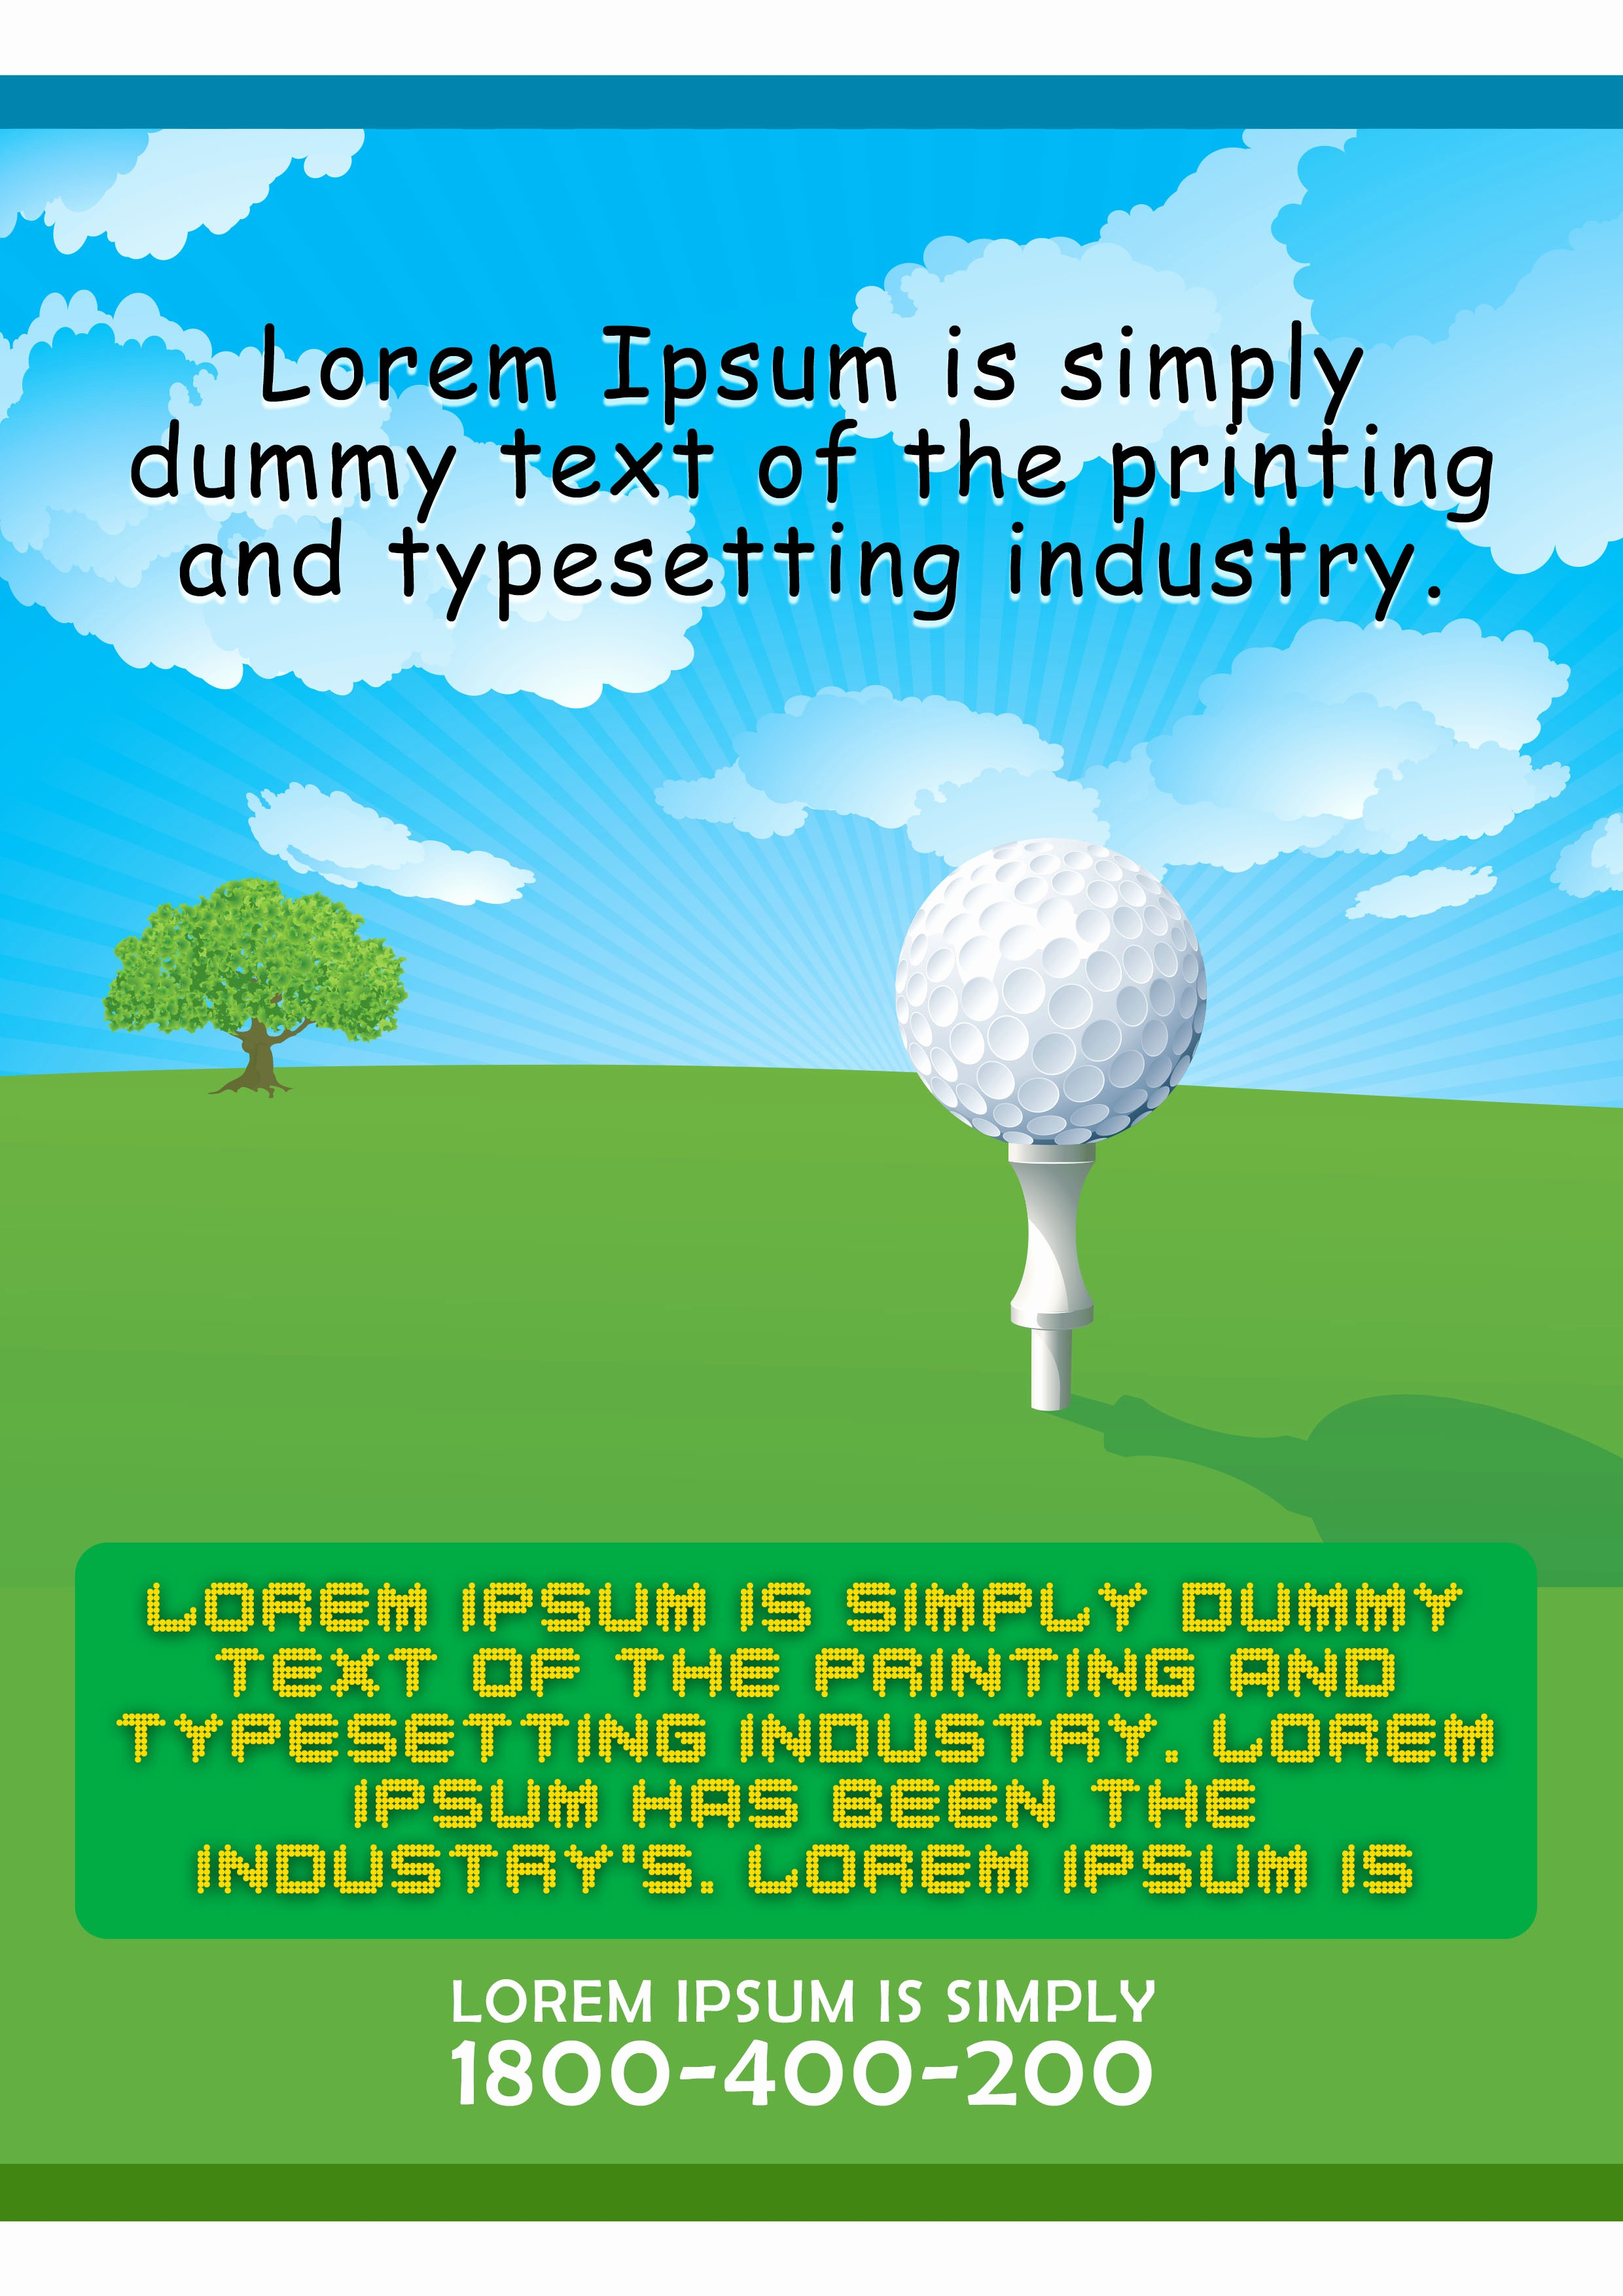 Golf tournament Flyer Template Word Fresh 15 Free Golf tournament Flyer Templates Fundraiser